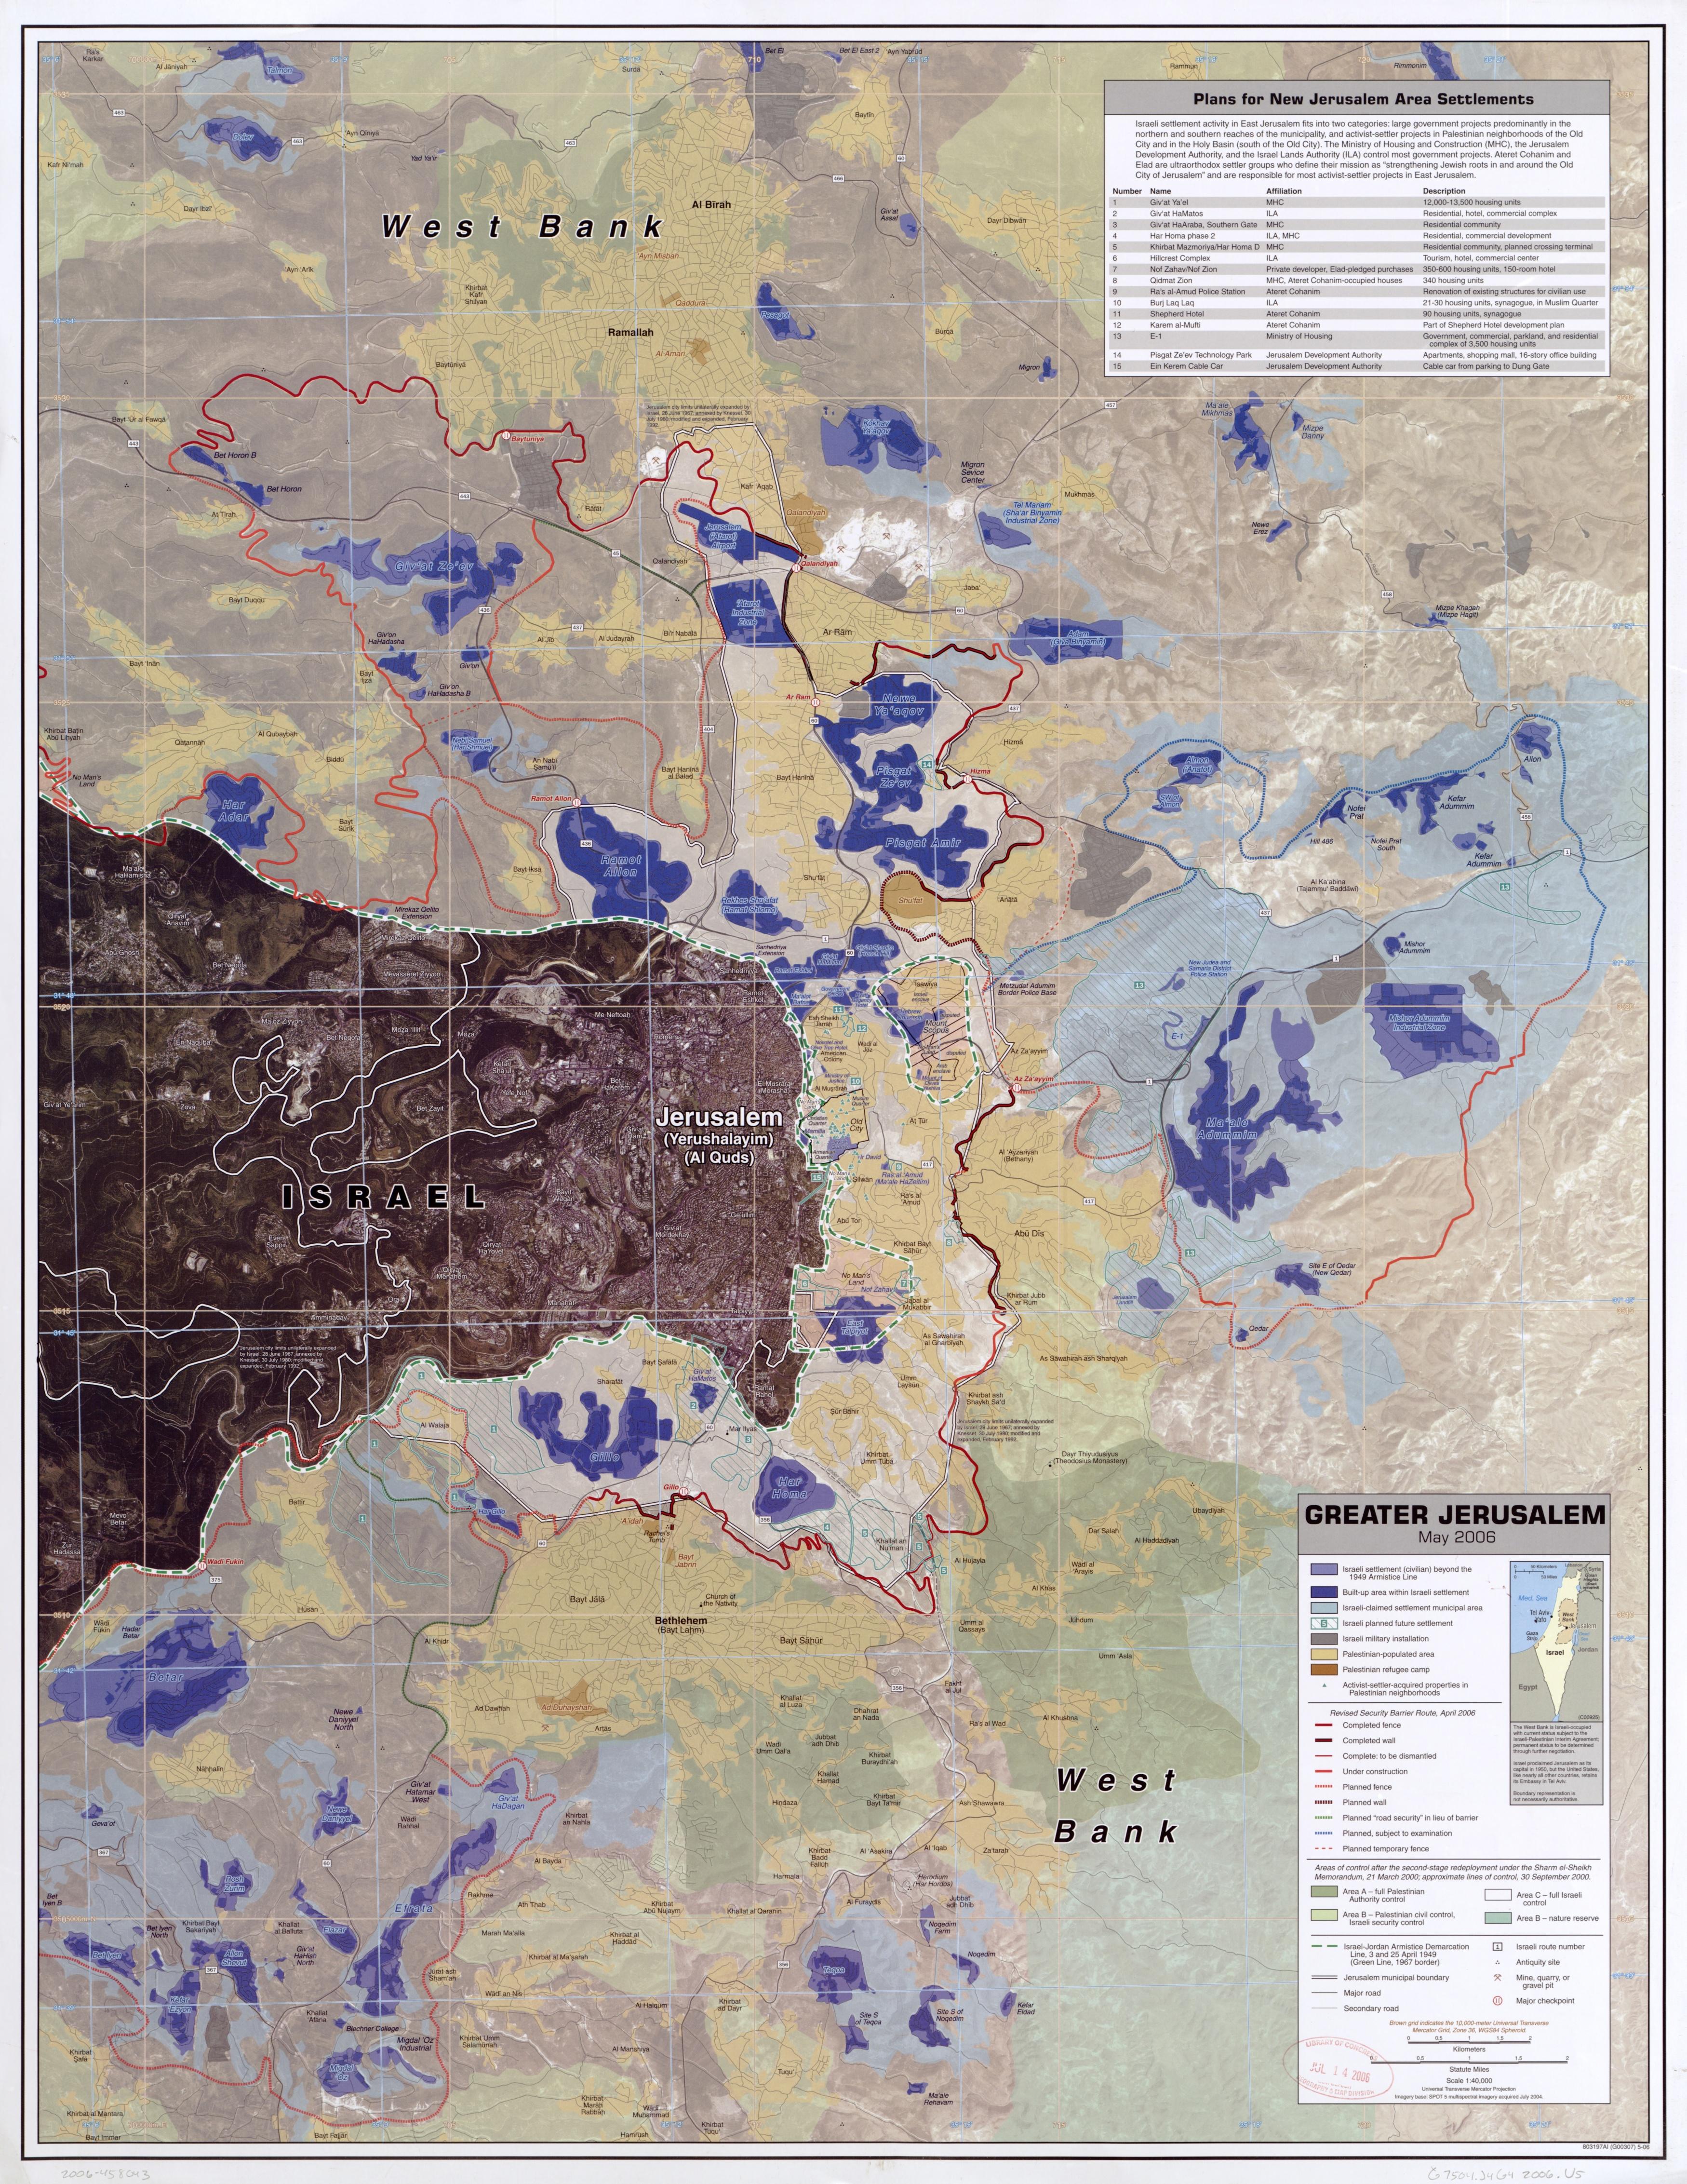 FileGreater Jerusalem May 2006 CIA remotesensing map 3500pxjpg